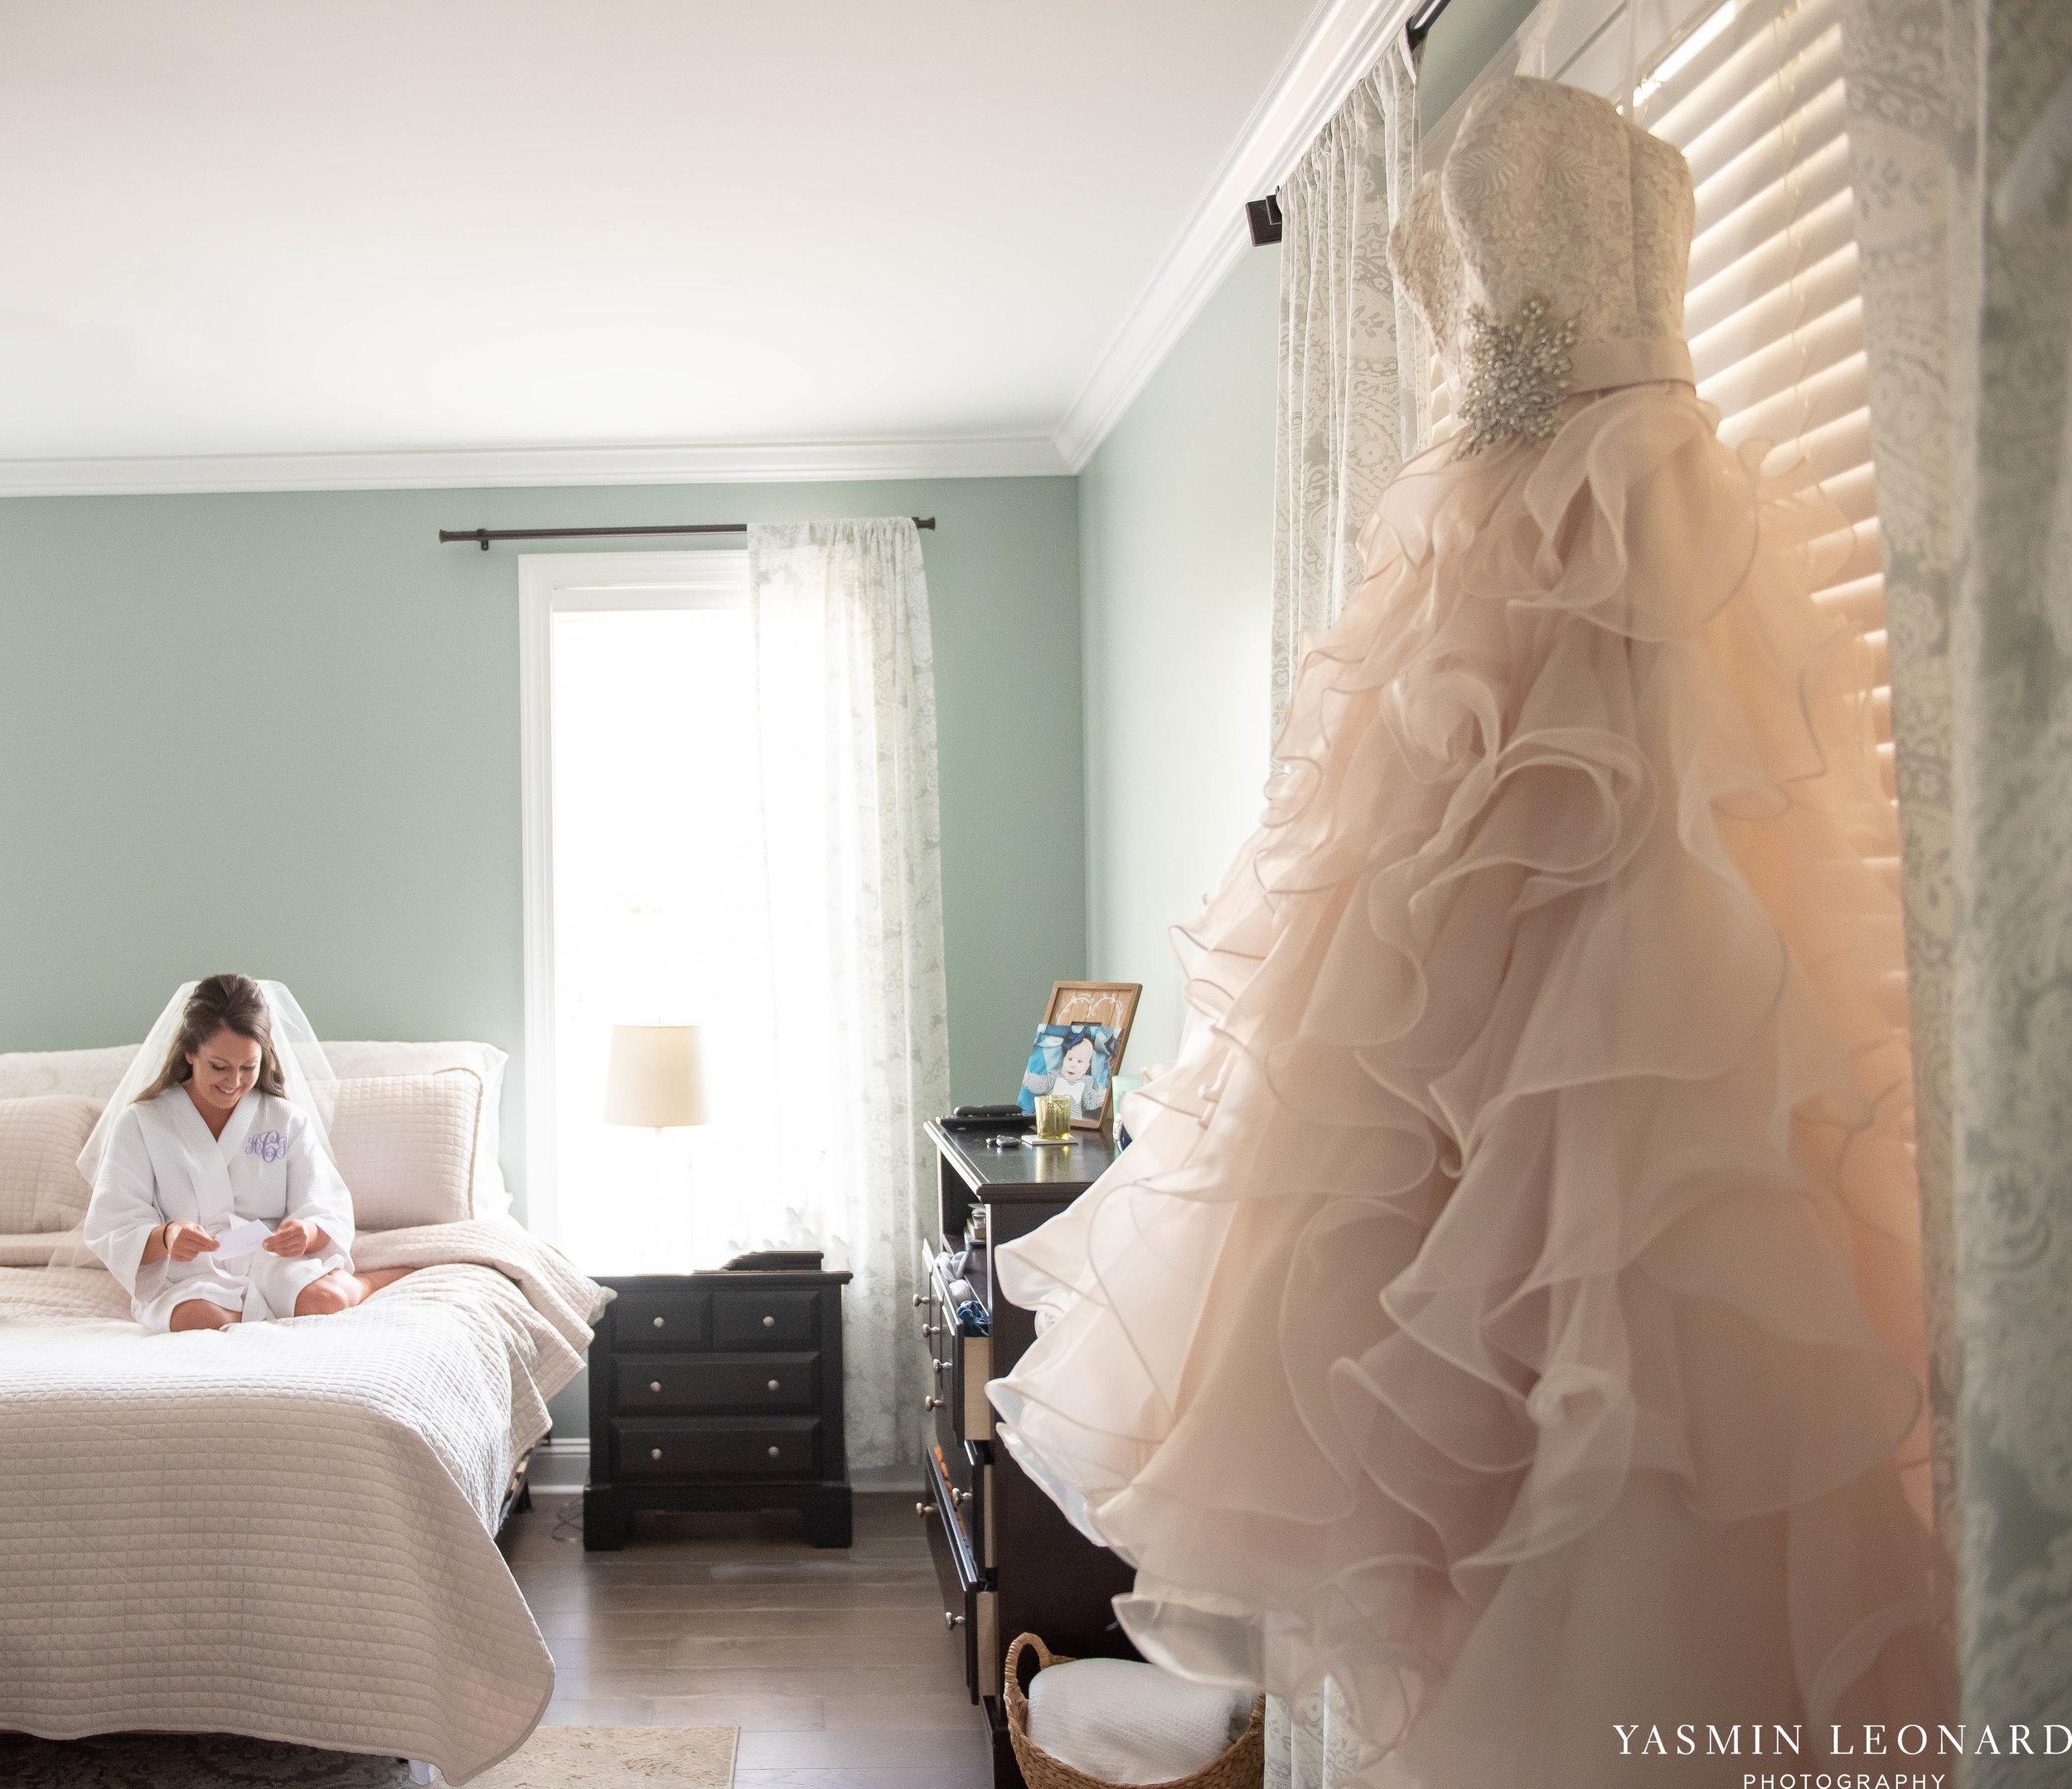 Rain on your wedding day - Rainy Wedding - Plan B for Rain - What to do if it rains on your wedding day - Wedding Inspiration - Outdoor wedding ideas - Rainy Wedding Pictures - Yasmin Leonard Photography-1.jpg